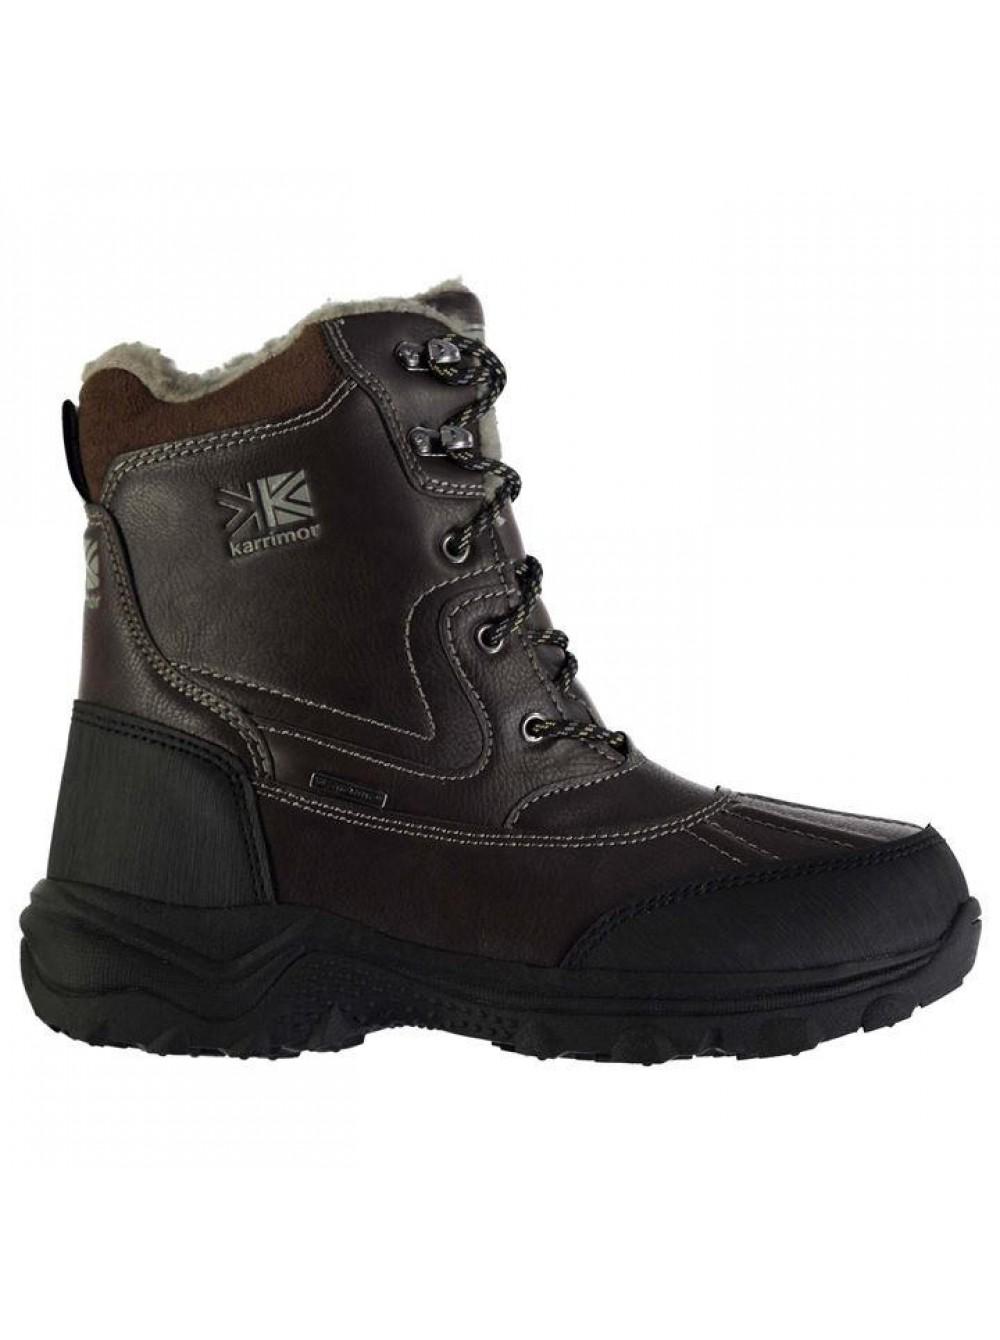 0bb39d877 Karrimor Casual Snow Boots - Зимние трекинговые ботинки - Ботинки ...